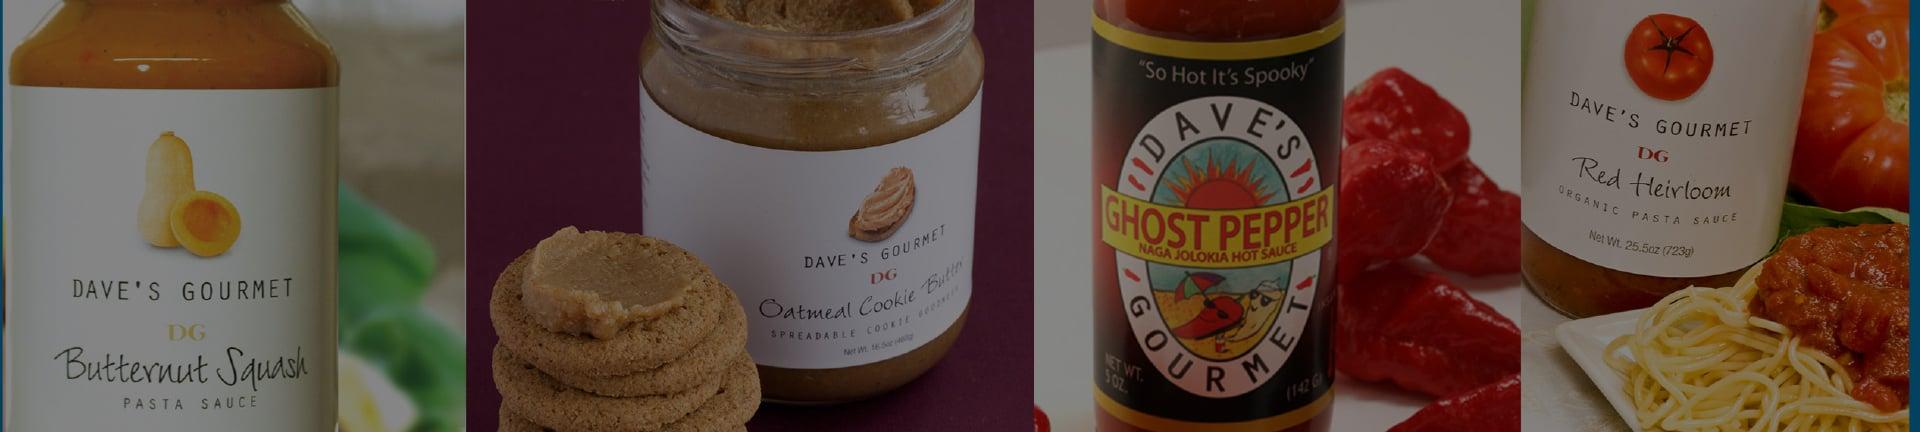 banner-daves-gourmet-1